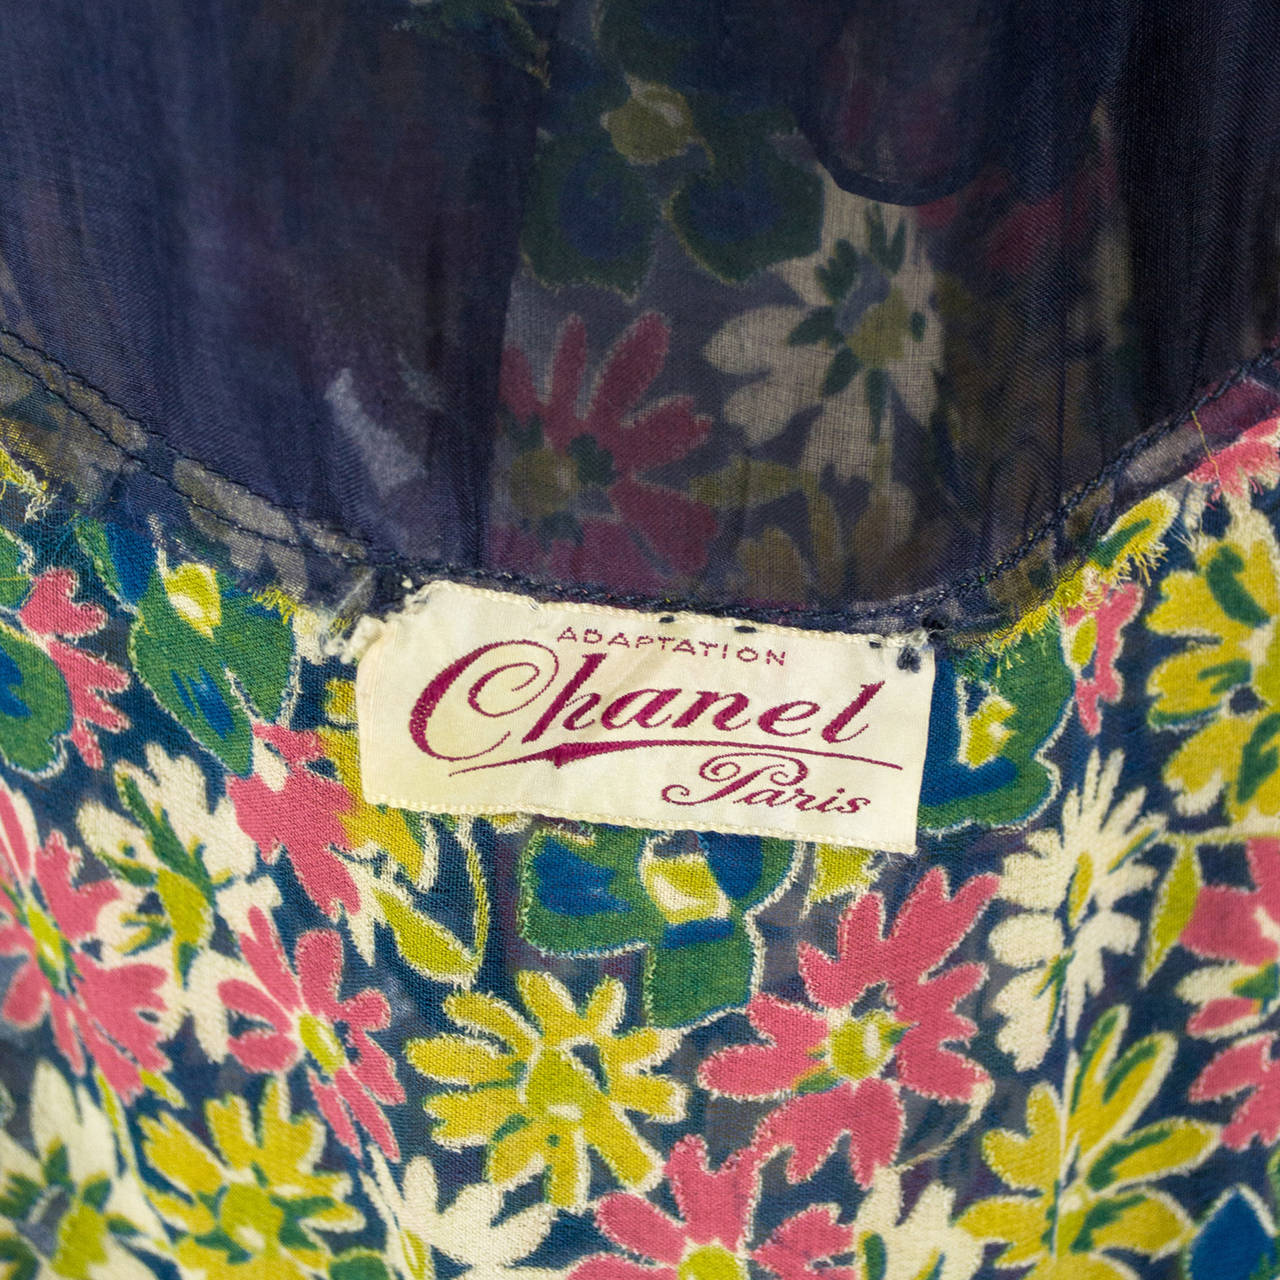 Rare 1930s Vintage Chanel Adaptation Dress Floral Velvet Applique Silk Organza For Sale 3